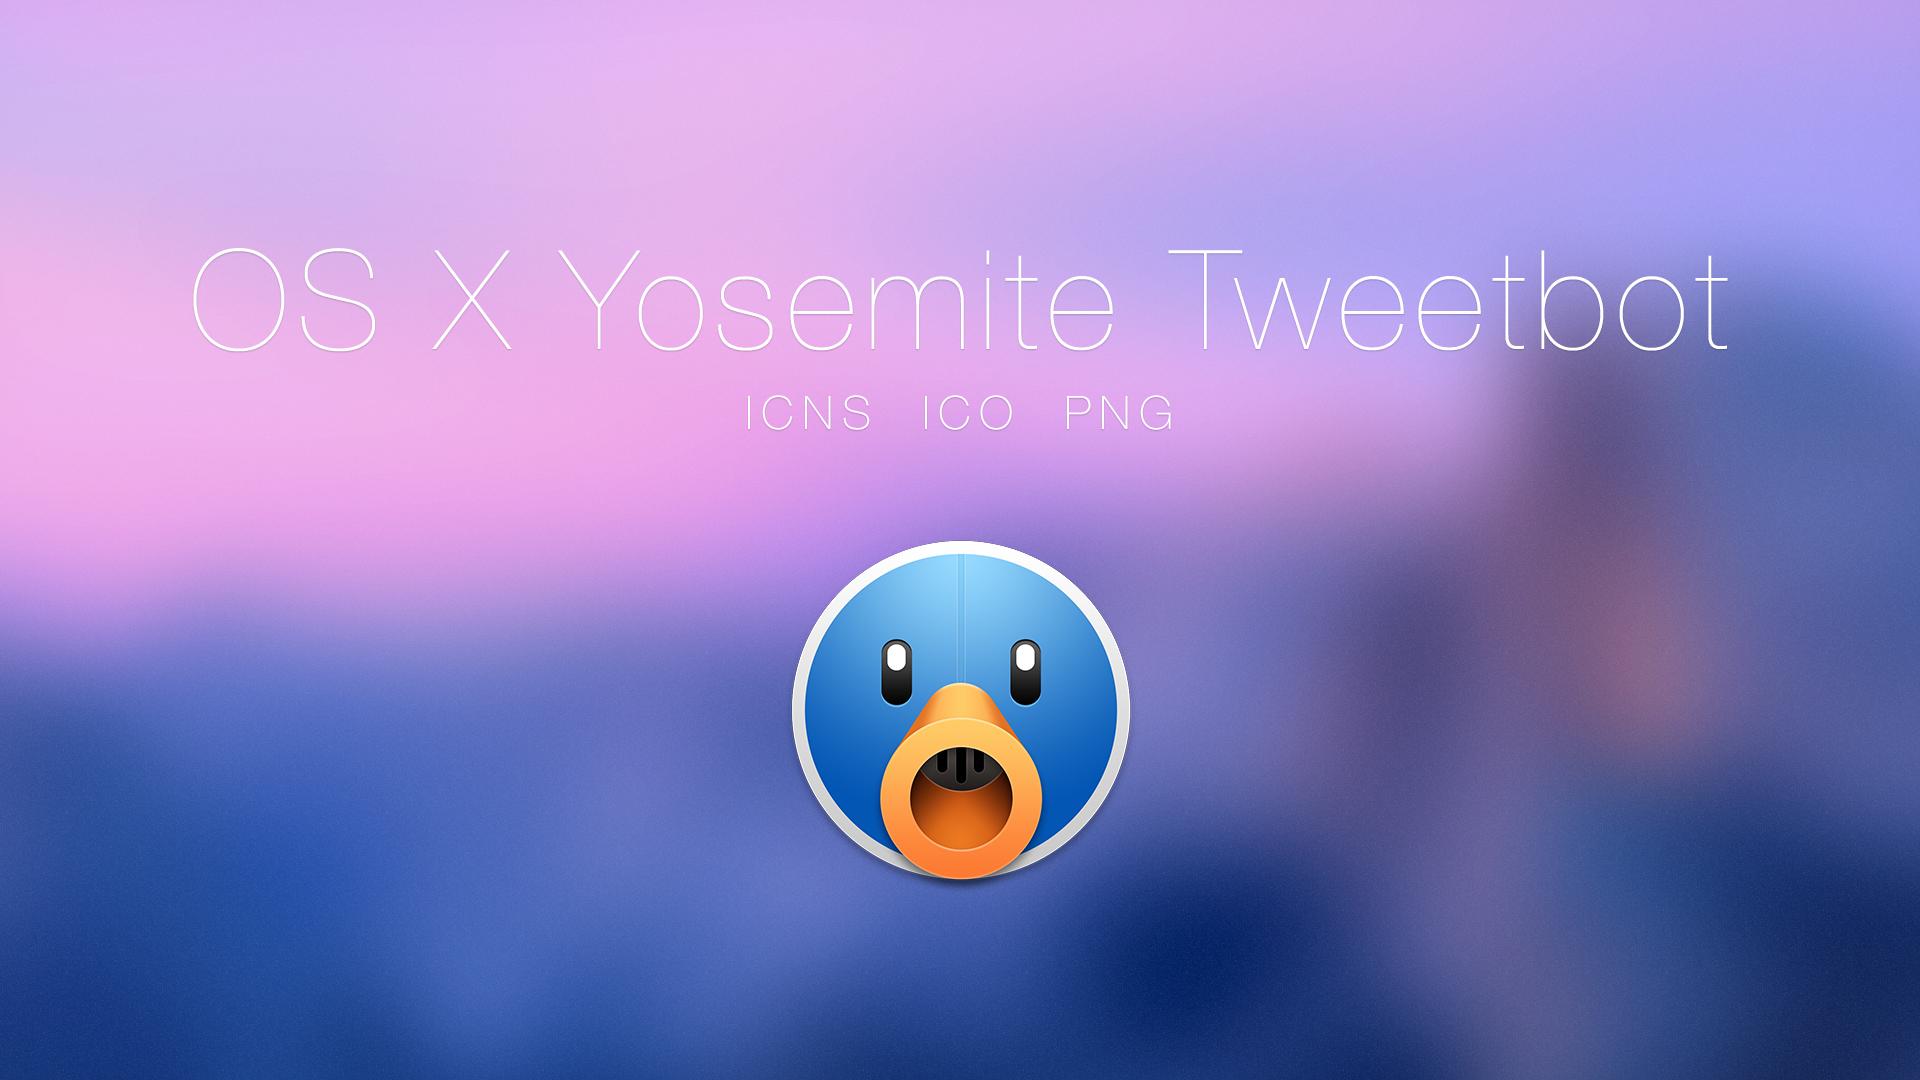 OS X Yosemite Tweetbot by JasonZigrino